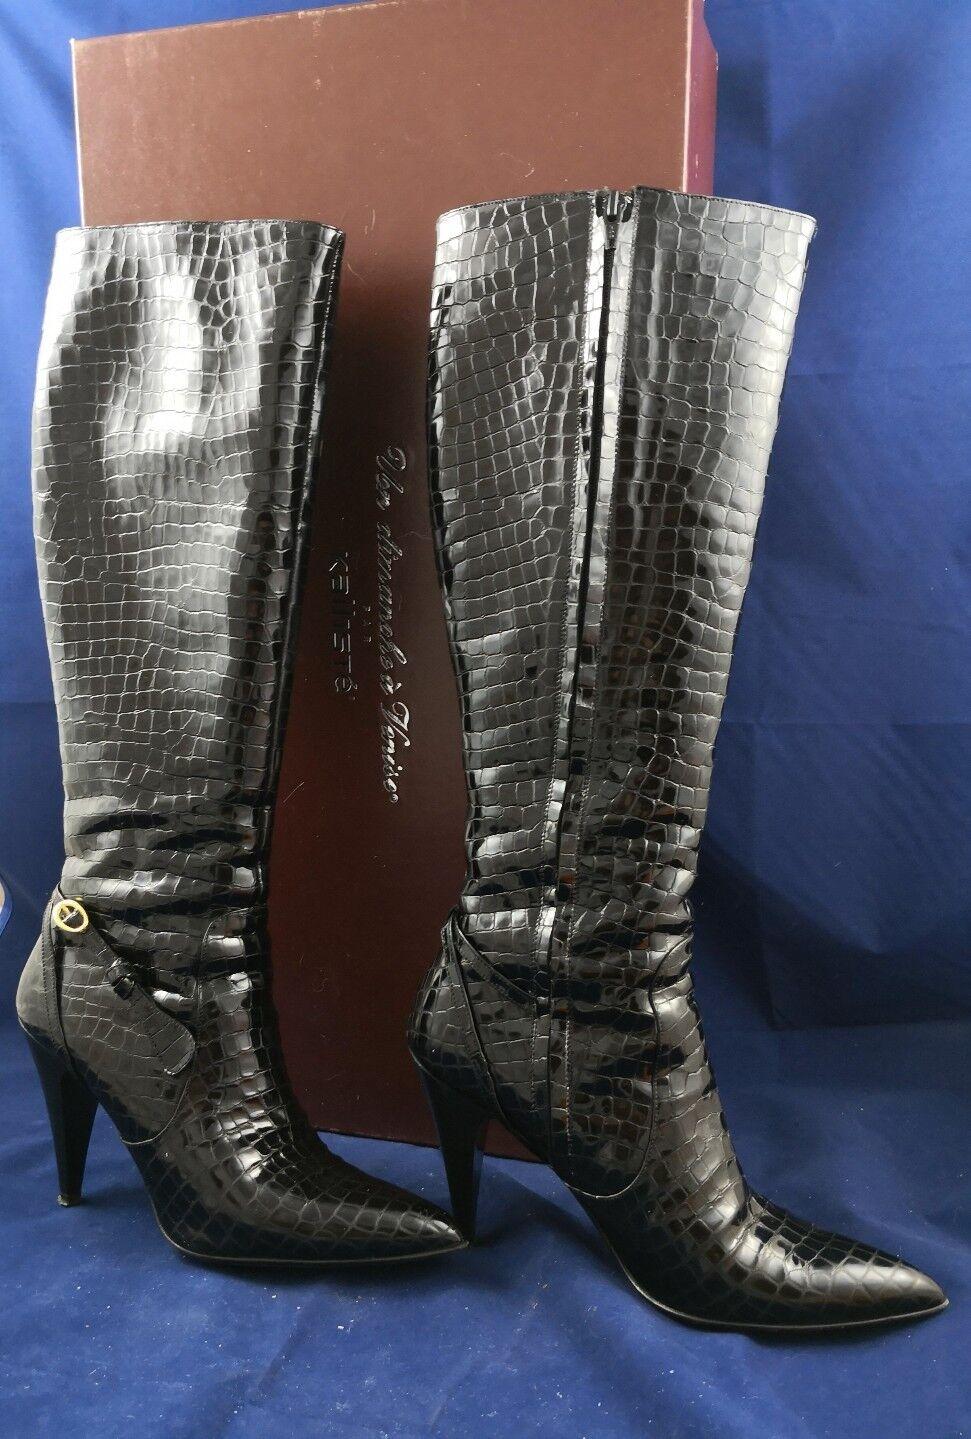 Stivali stampa donna alti vernice nero stampa Stivali coccodrillo pelle tacco alto Kalliste 37 50d3b1